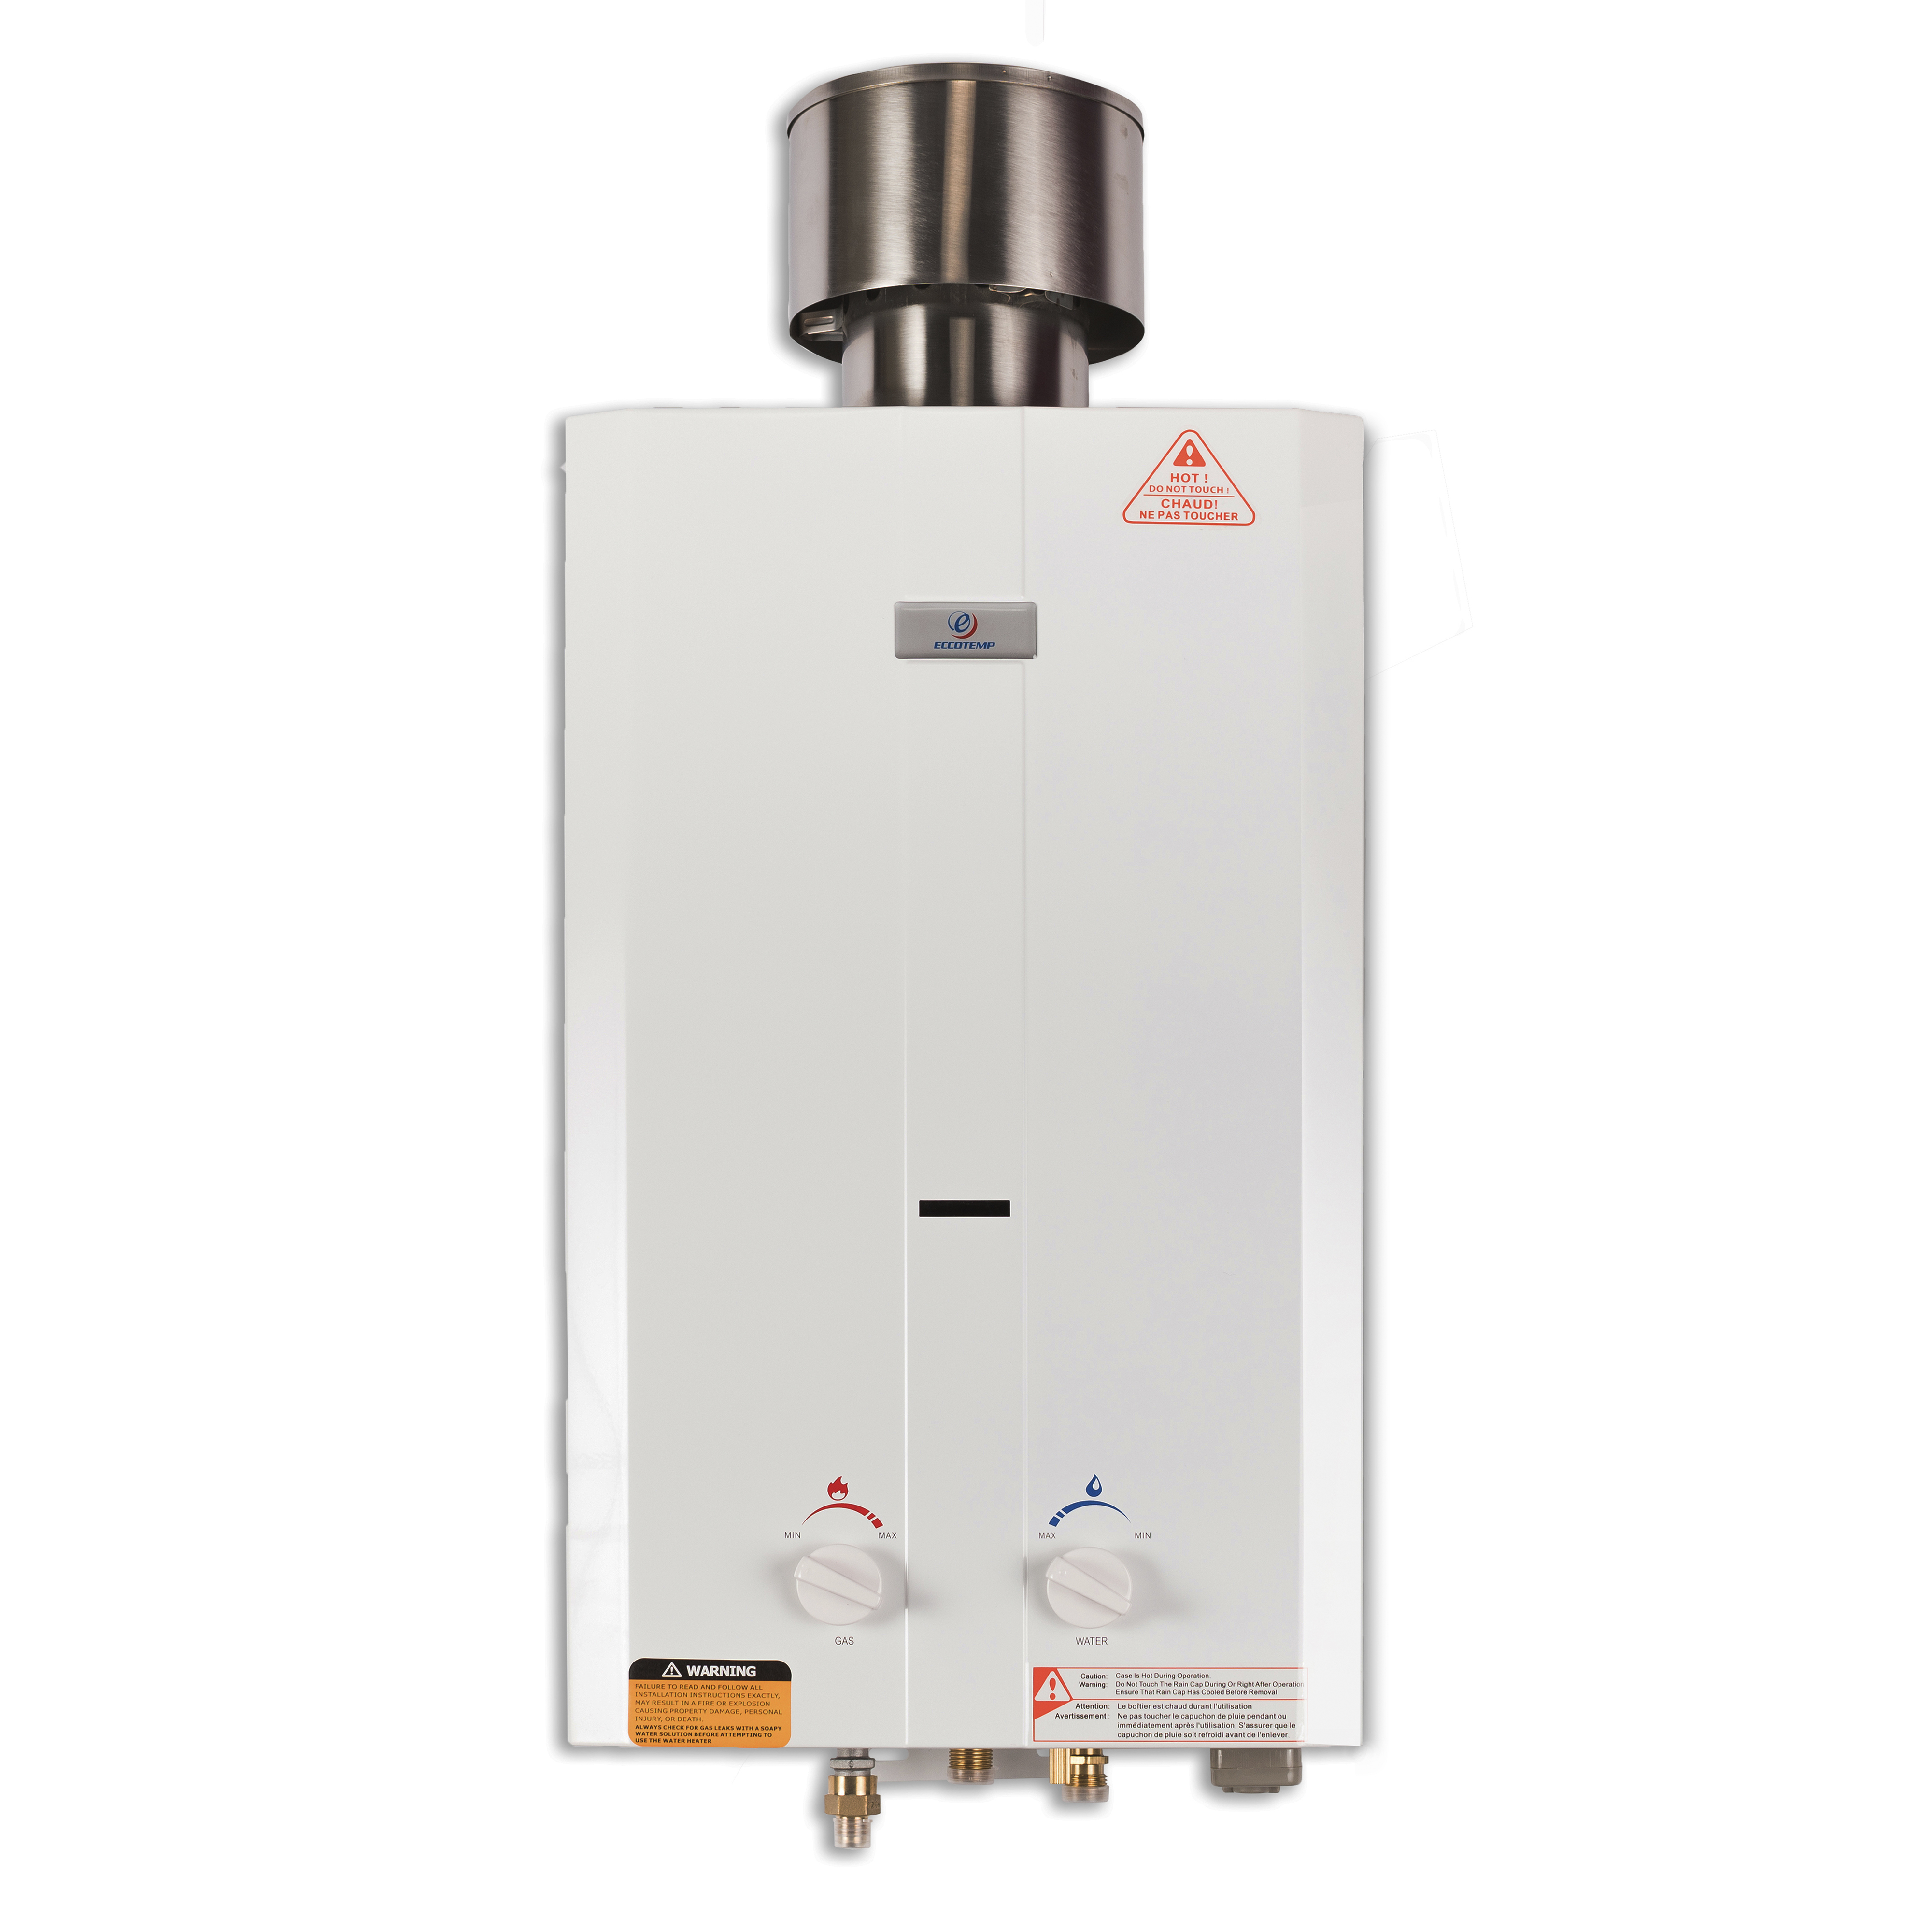 bathtub portable antibacterial panasonic htm pm heater sjkelectrical p pump non shower i head water end sale dh